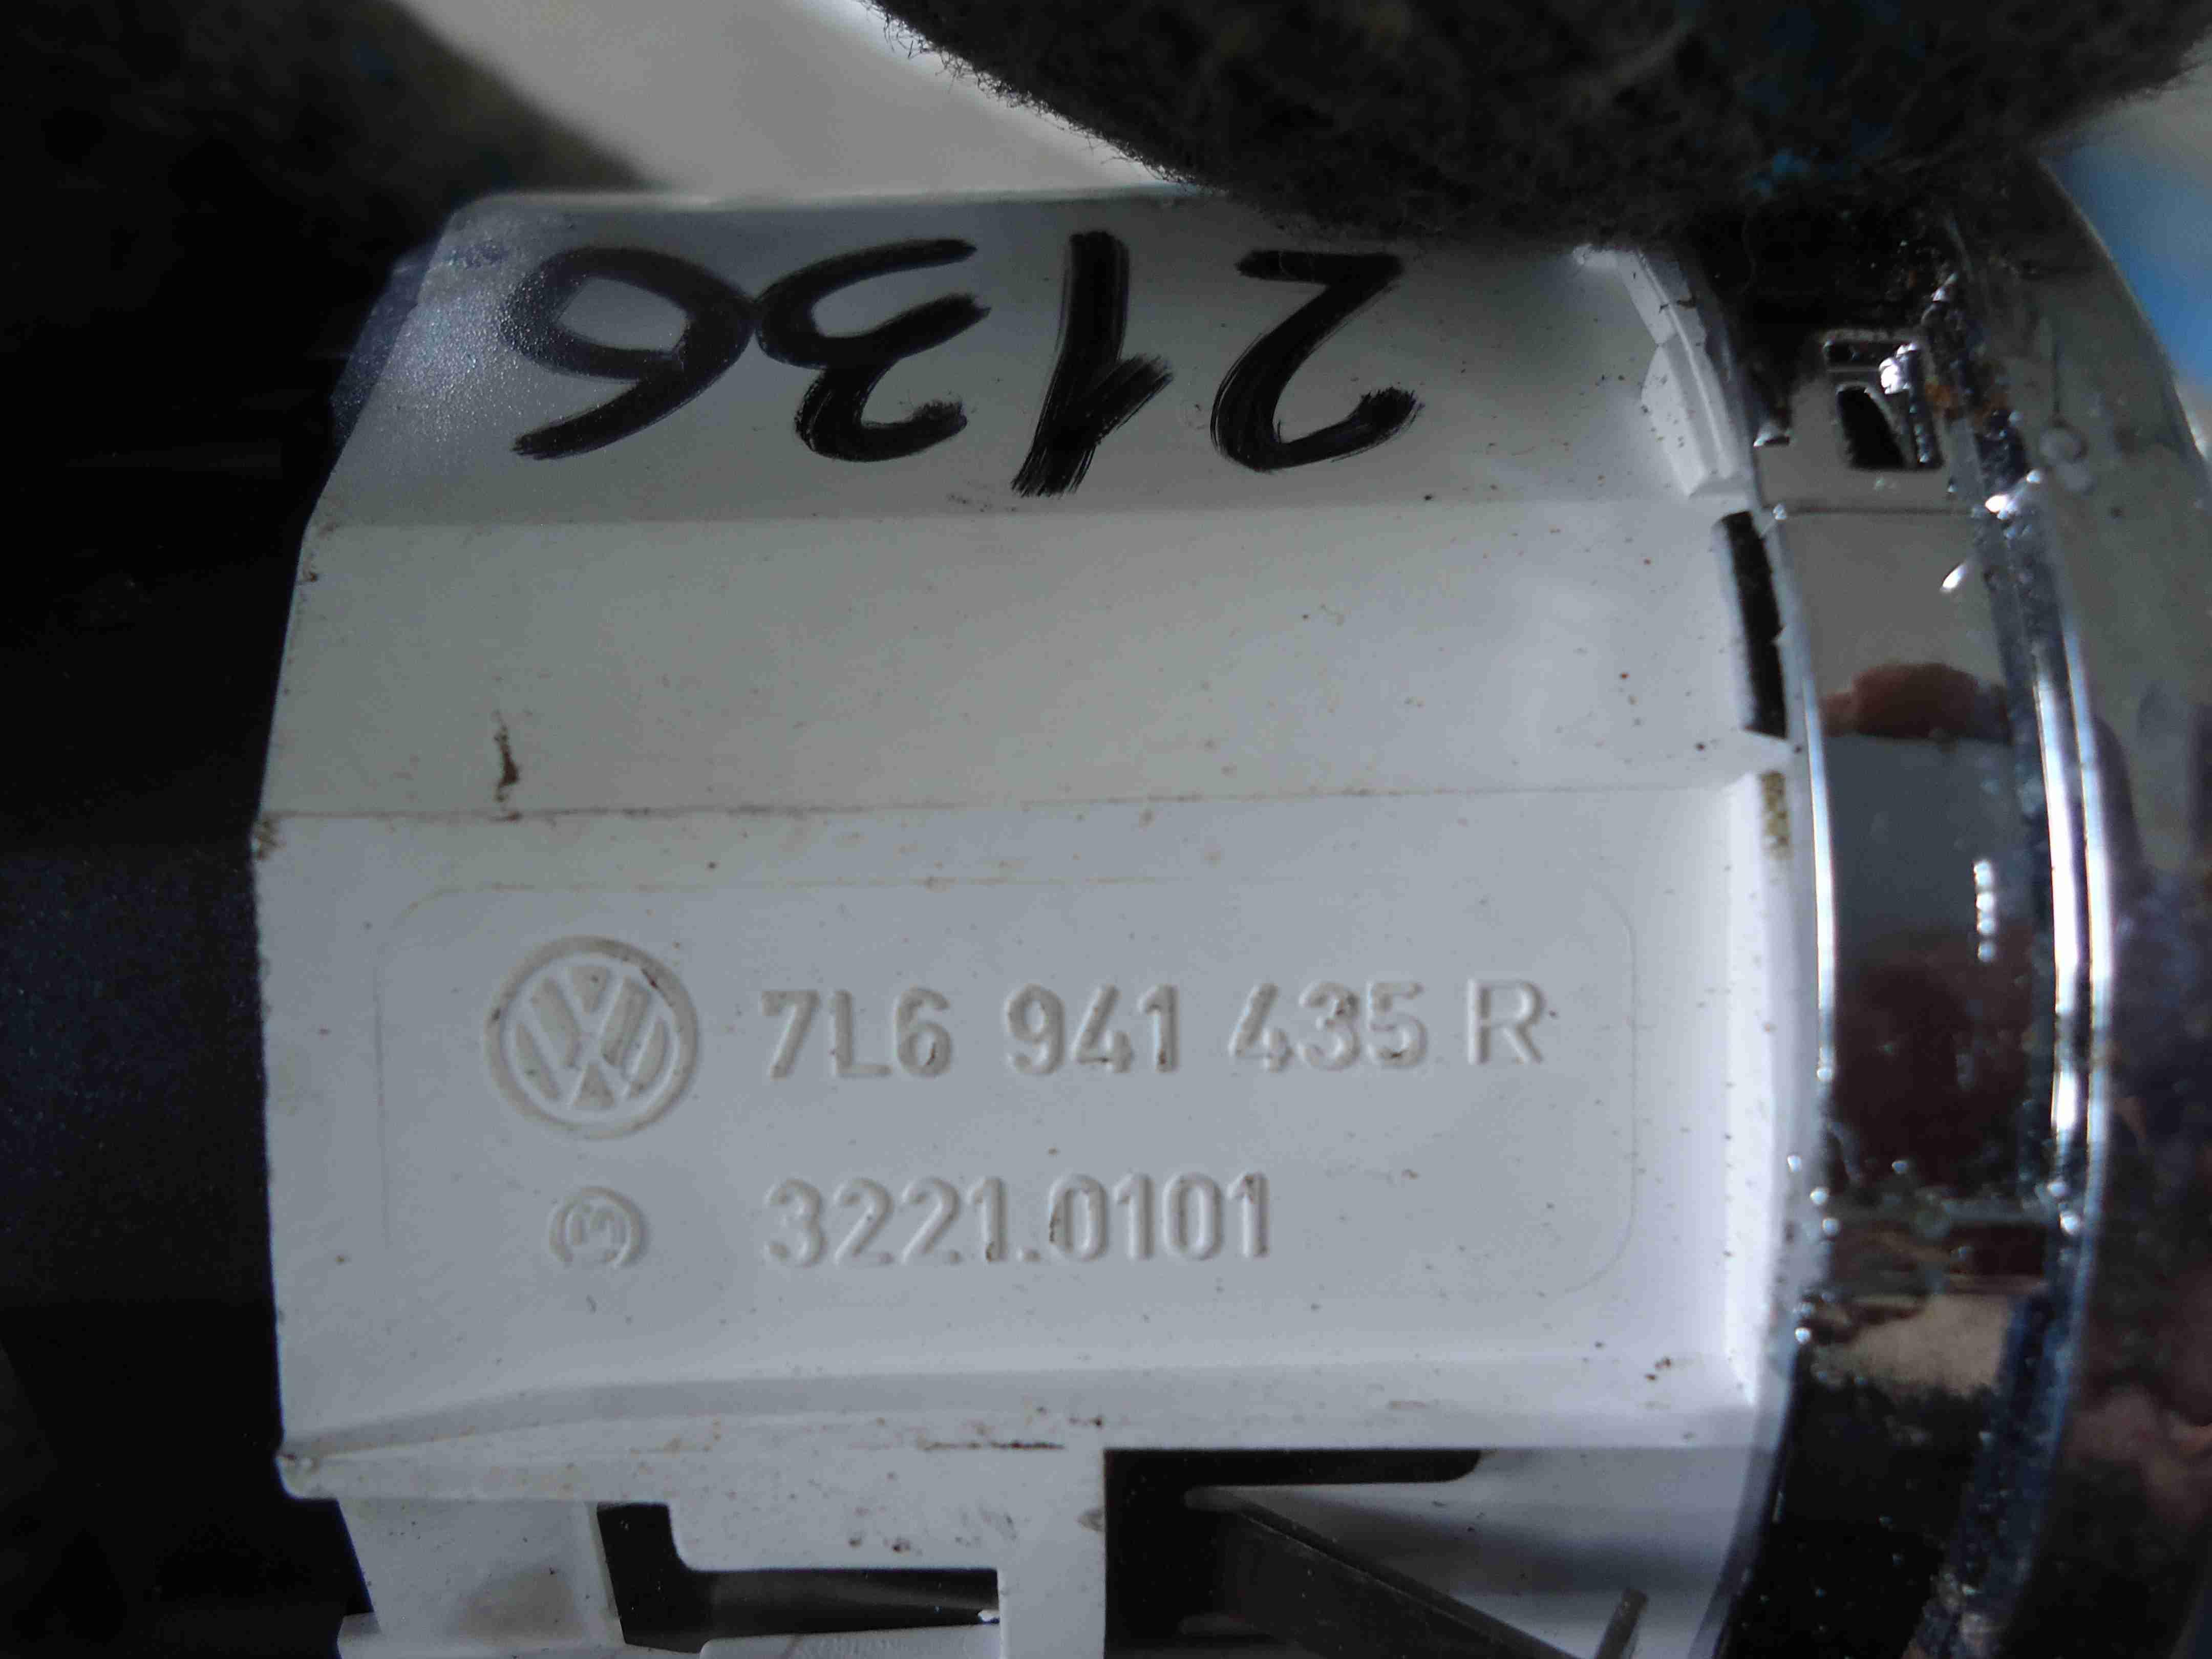 Переключатель полного привода   7L6941435R